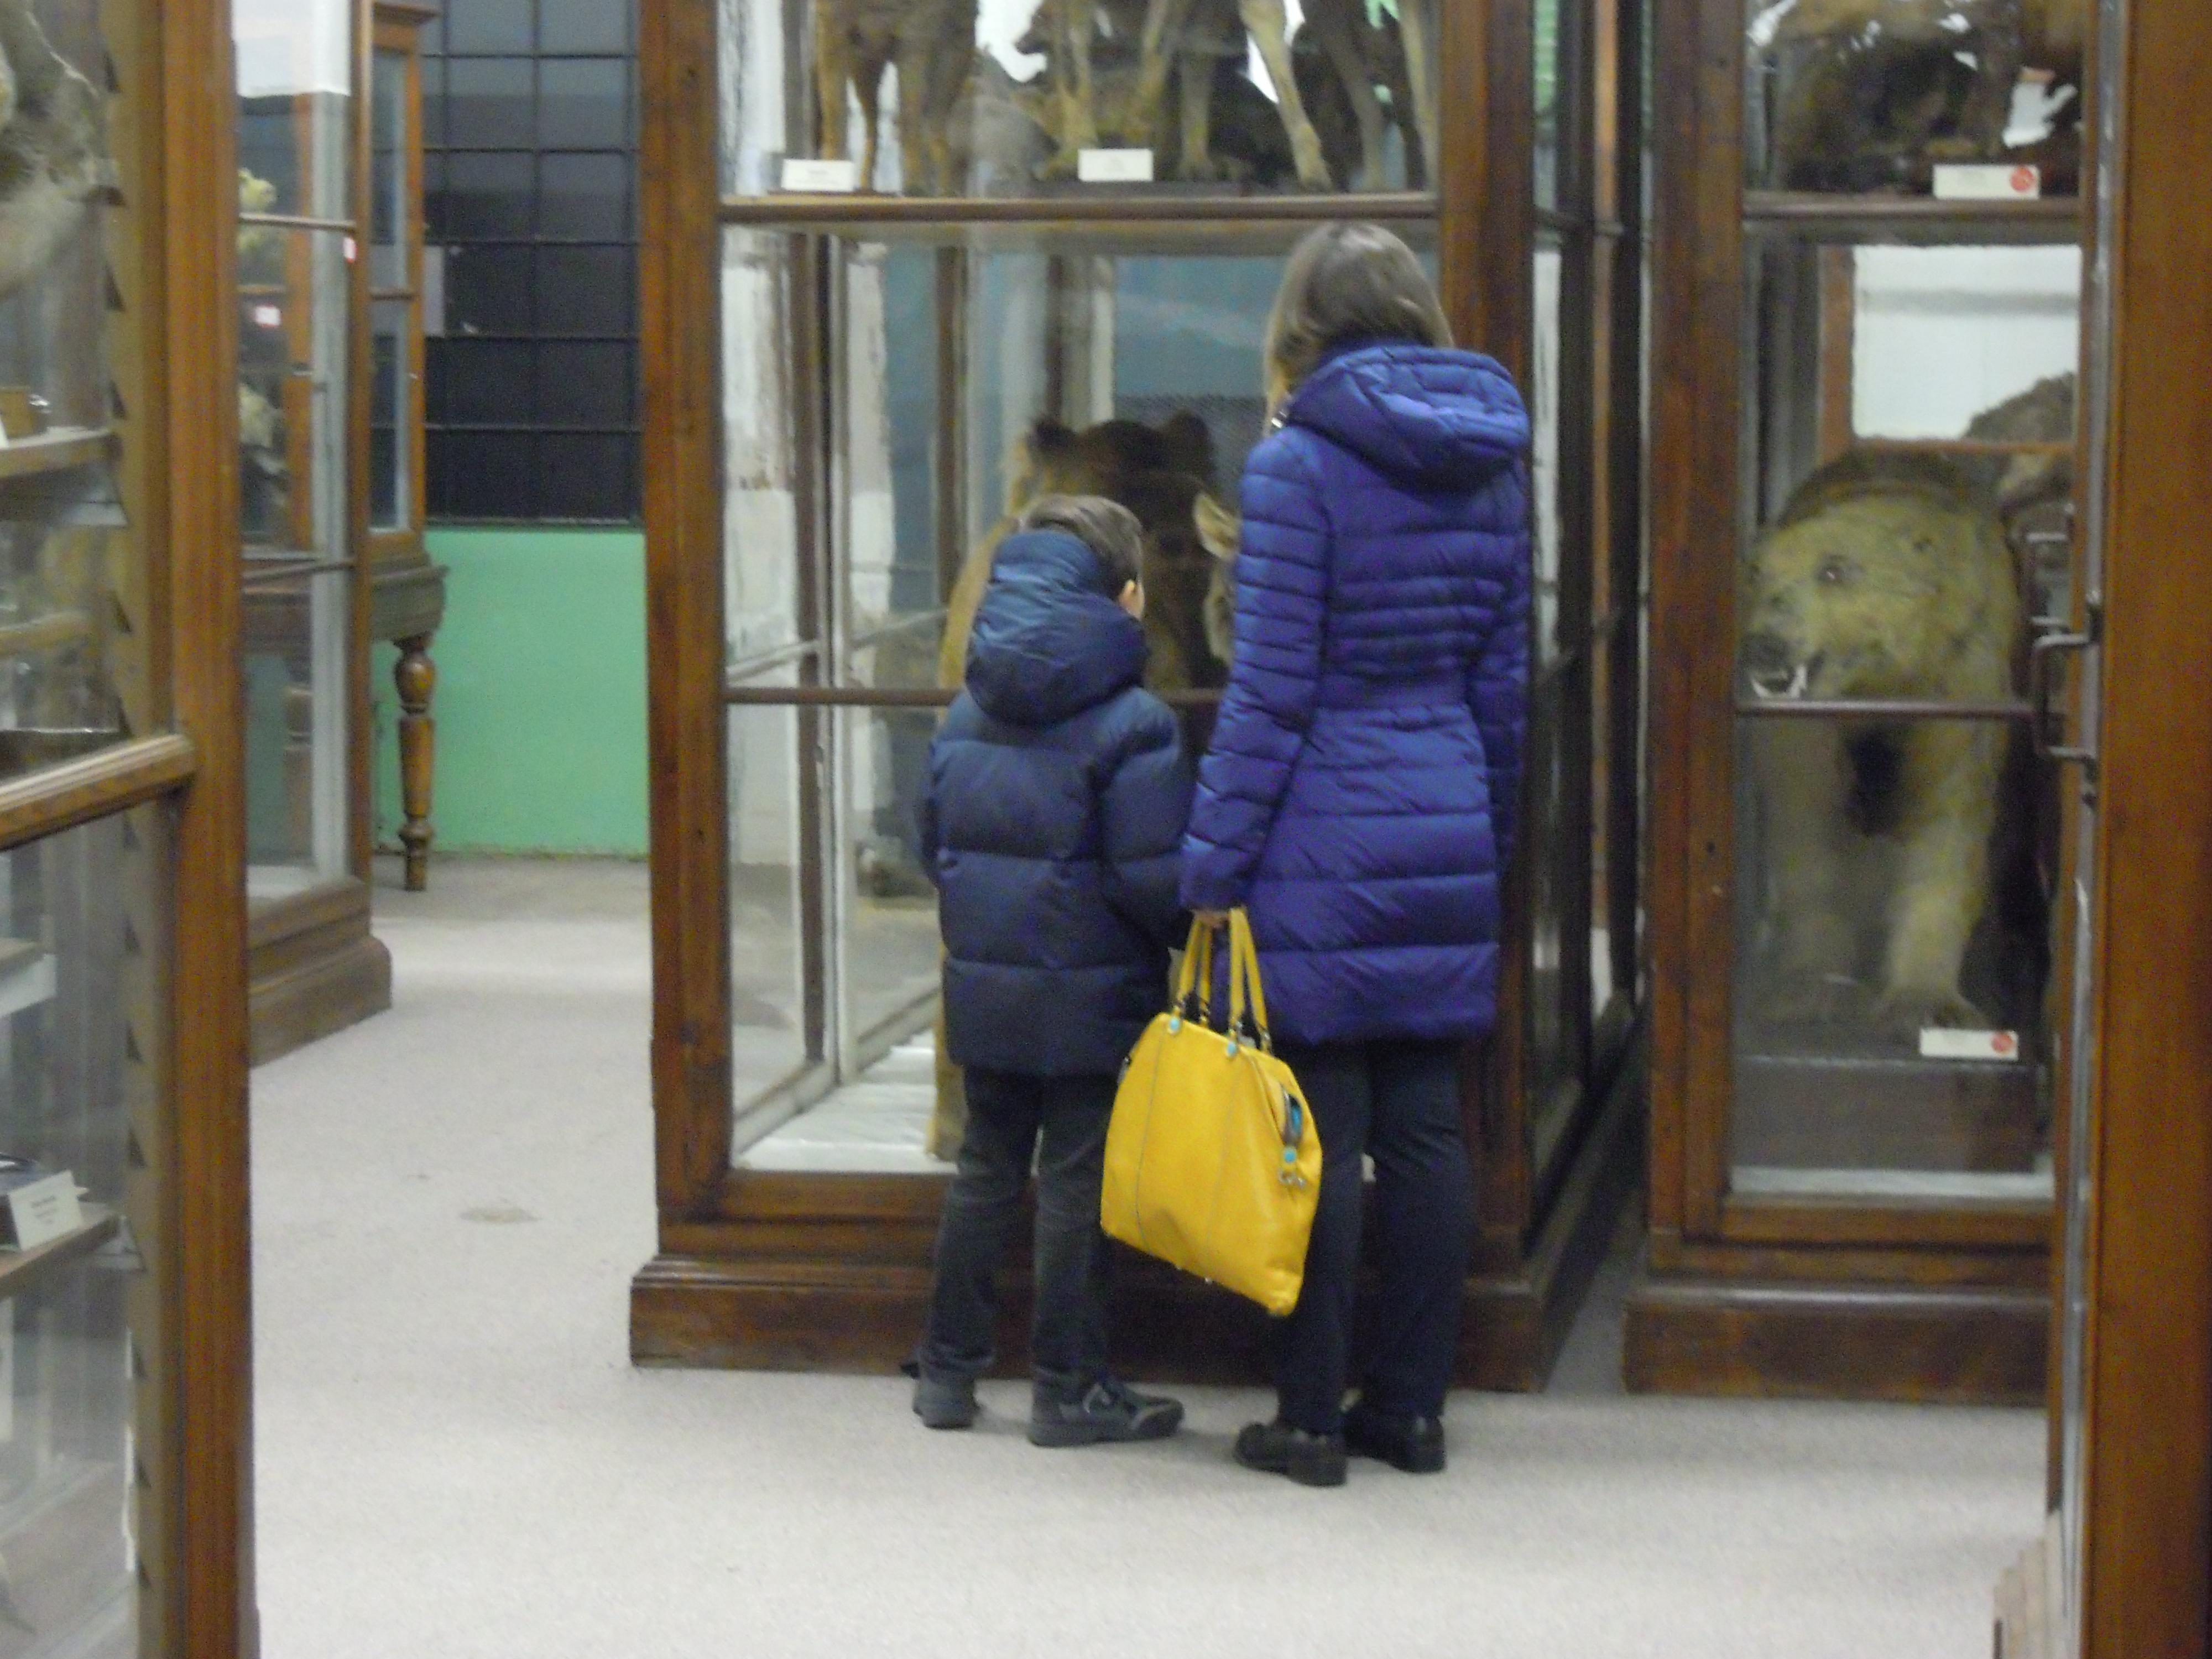 14 novembre – Apertura Museo di Storia Naturale (sede via Guffanti)